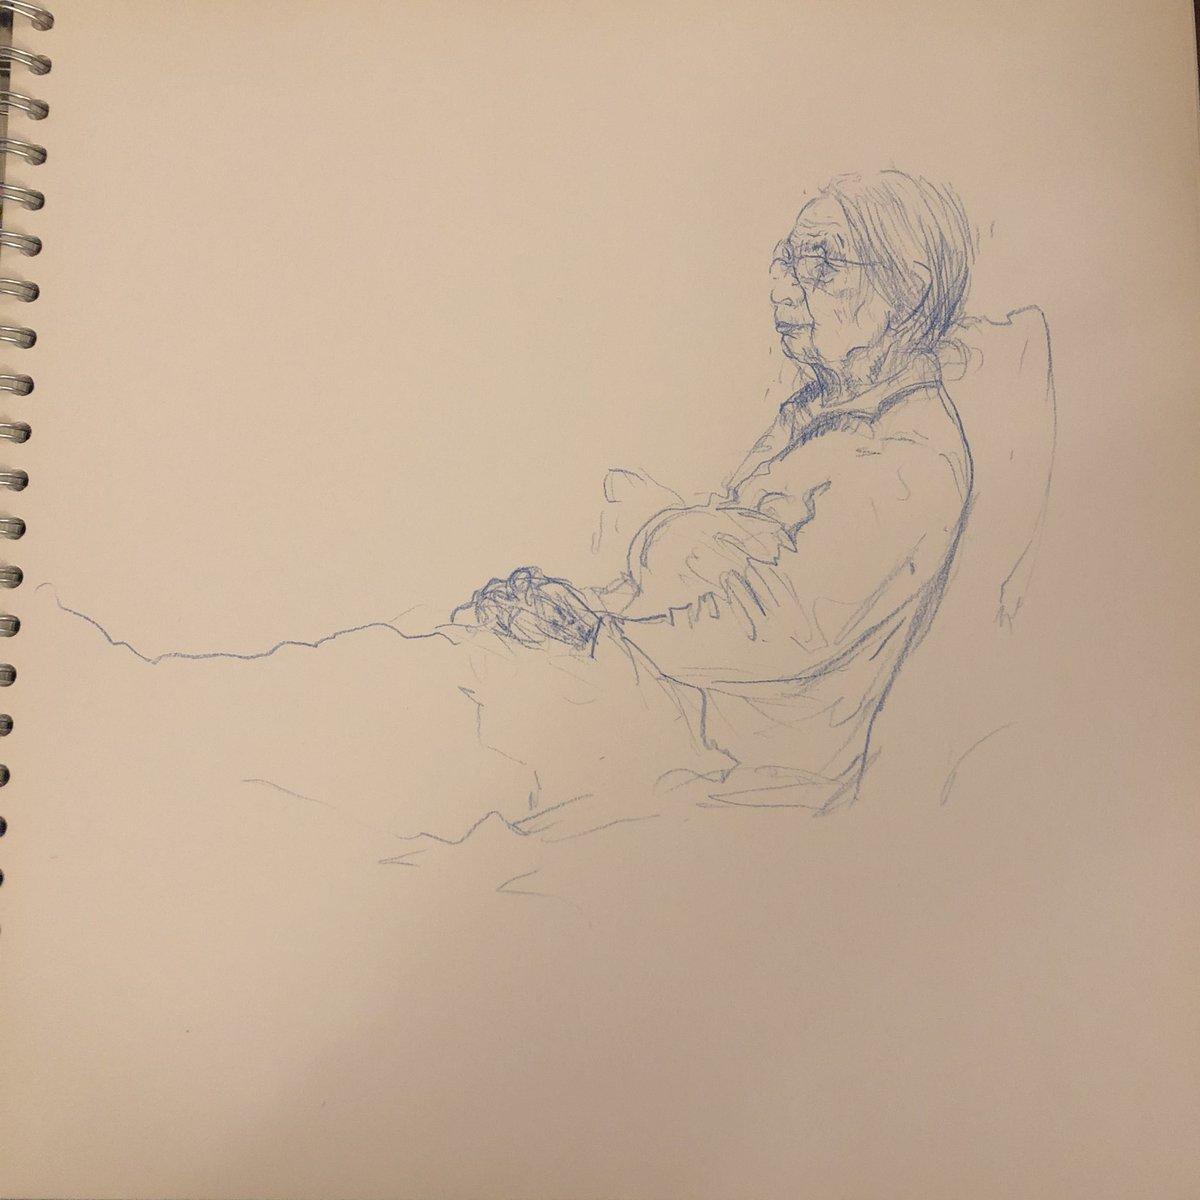 04-08-20 crisp sandwich #sketchbook #madhu #drawing #healthyeating pic.twitter.com/7awWWBLDN6